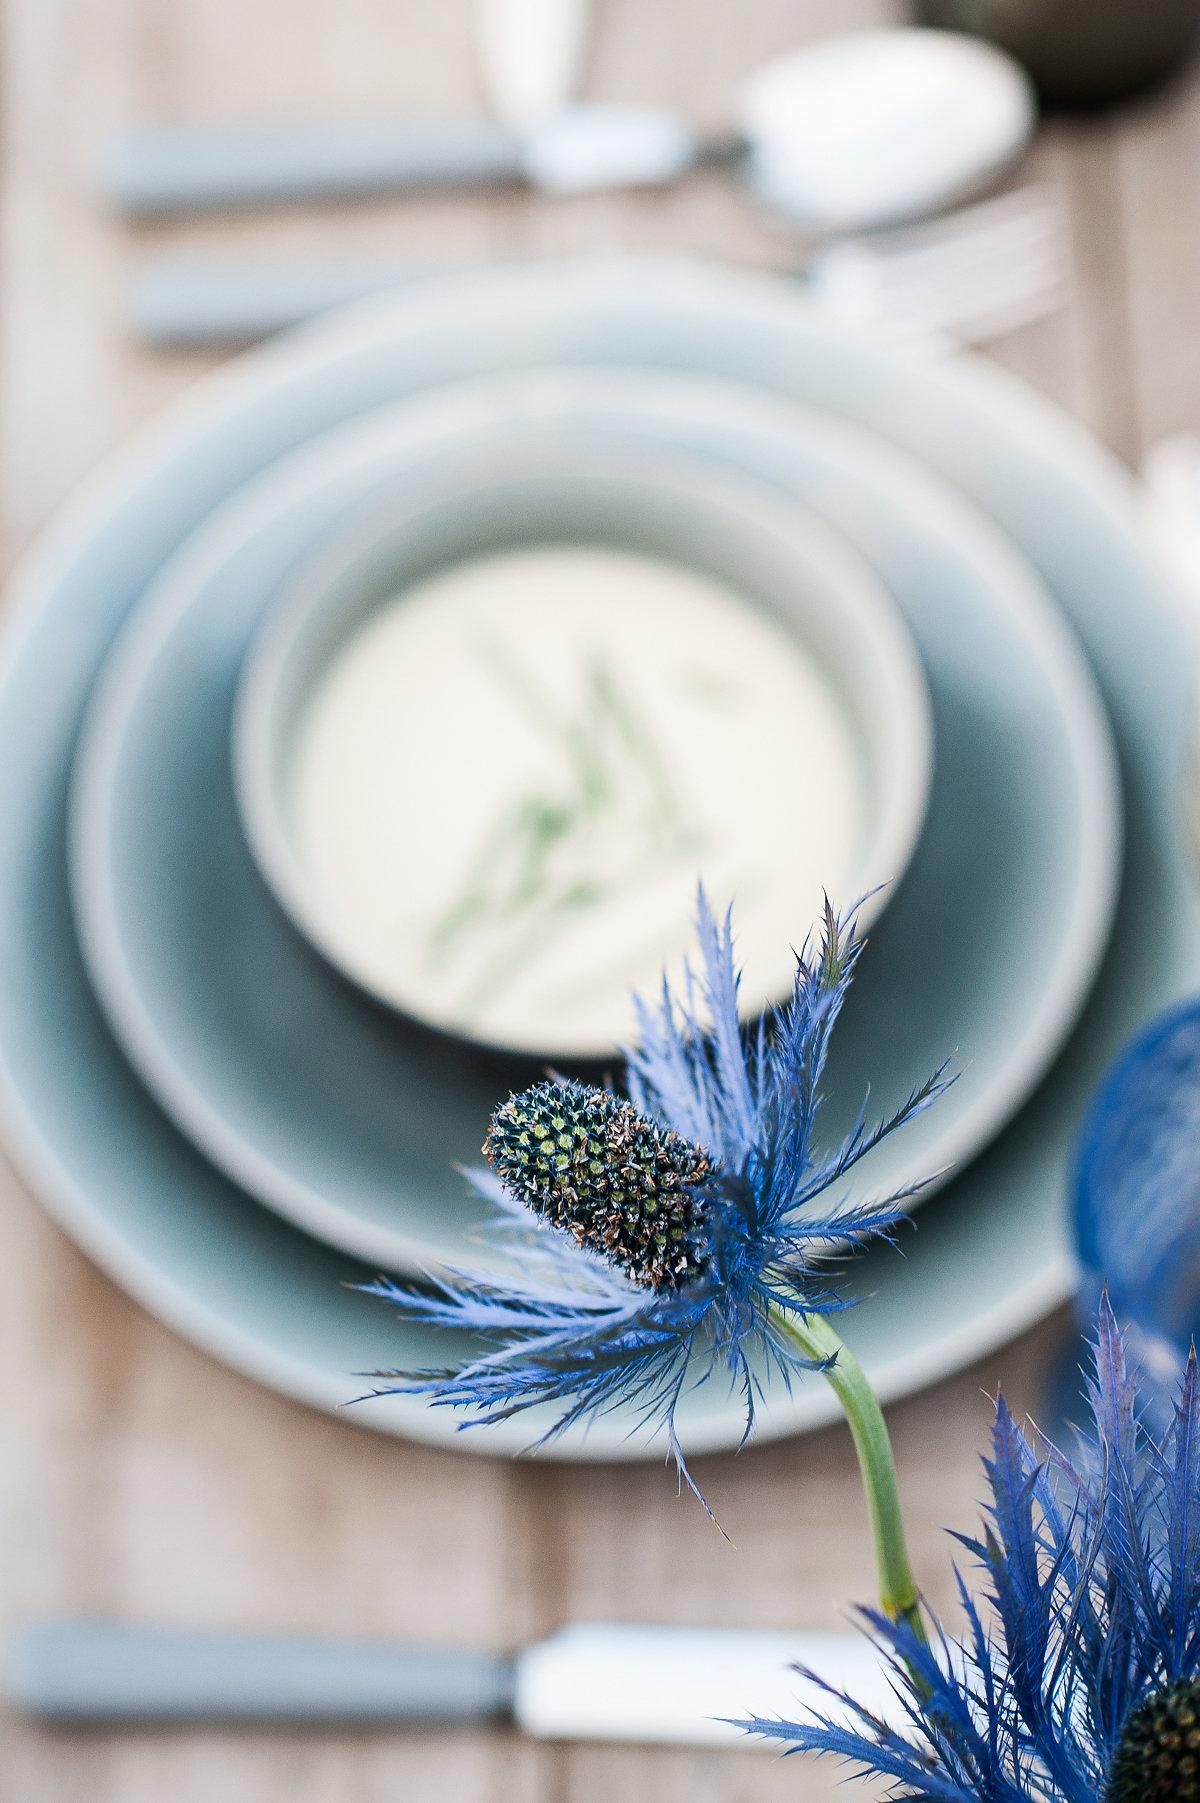 calista-one-lista-de-bodas-online-blog-de-bodas-inspiracion-decoracion-mesas-paula-franco-1